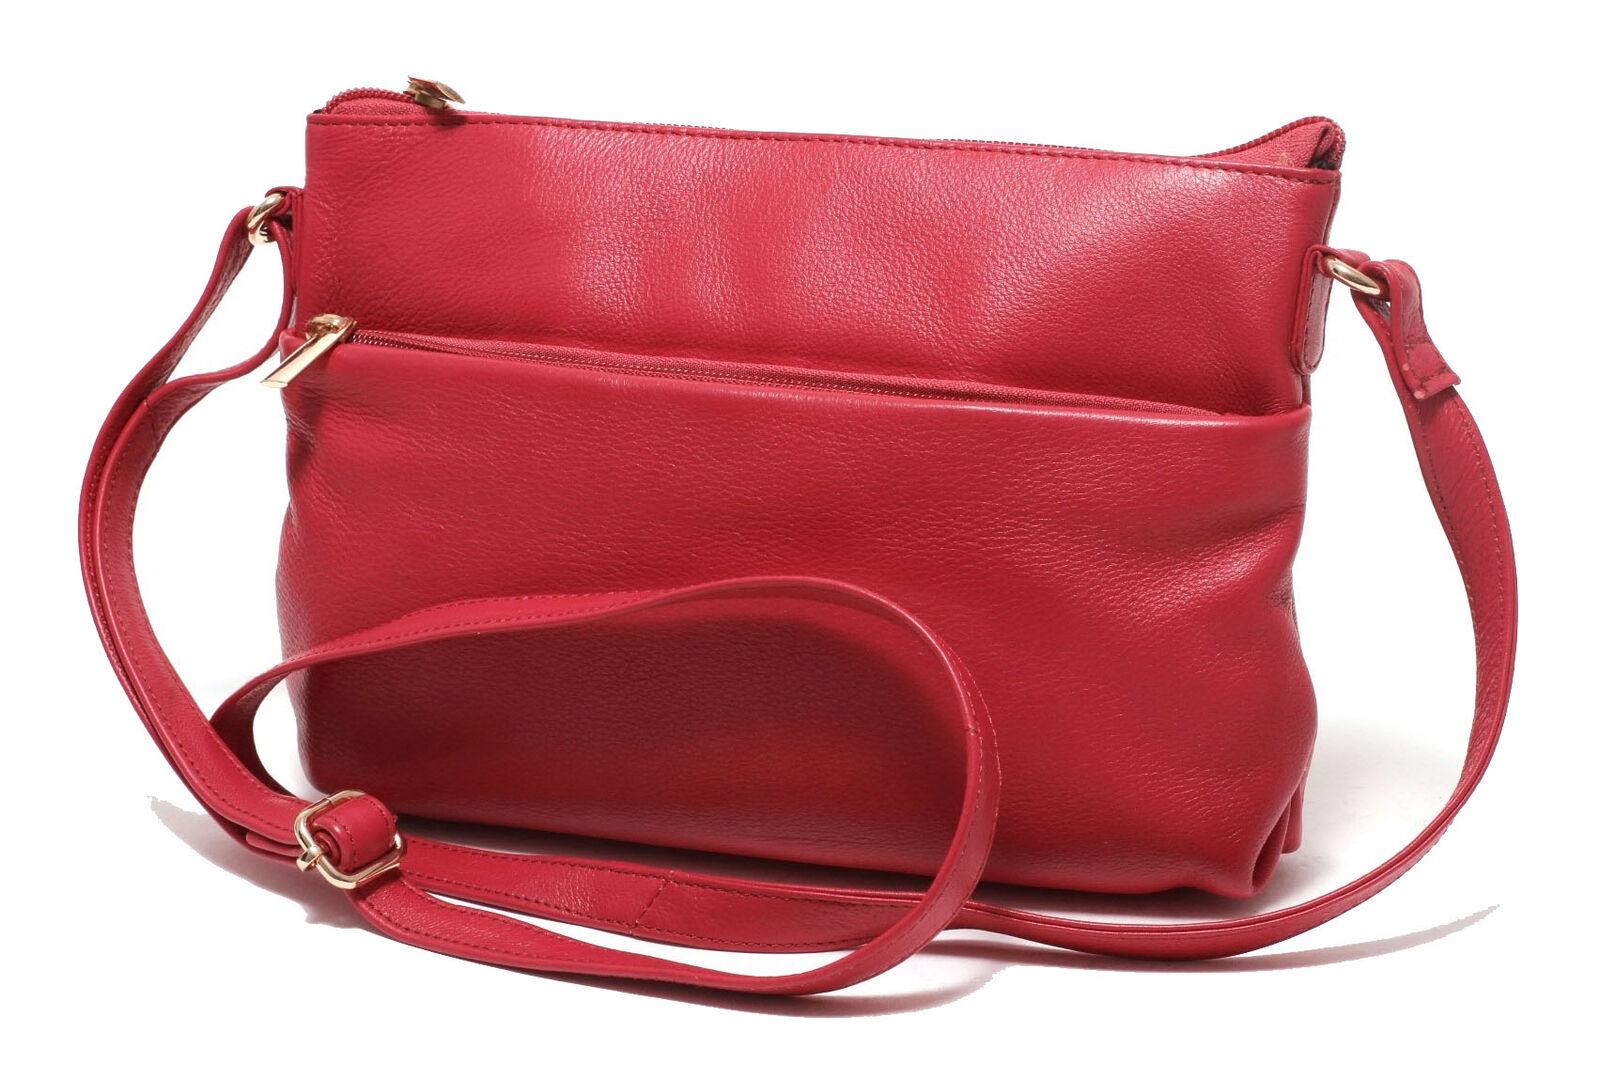 Leder Damen Handtasche rot Ledertasche Clutch Schultertasche Abend Tasche Bag